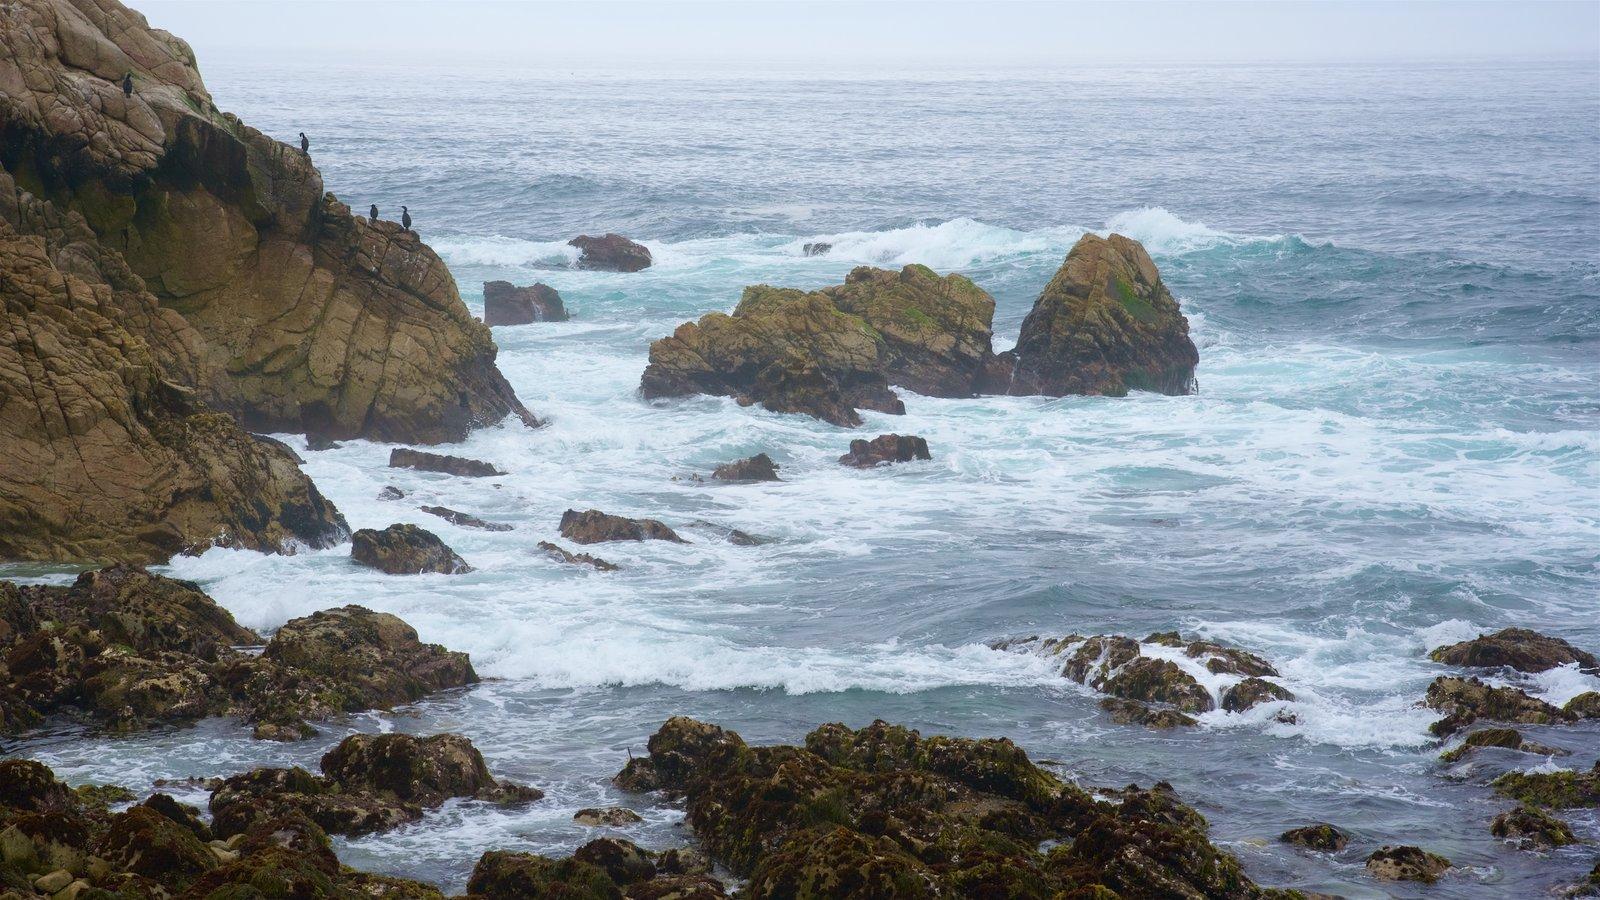 17-Mile Drive caracterizando litoral acidentado